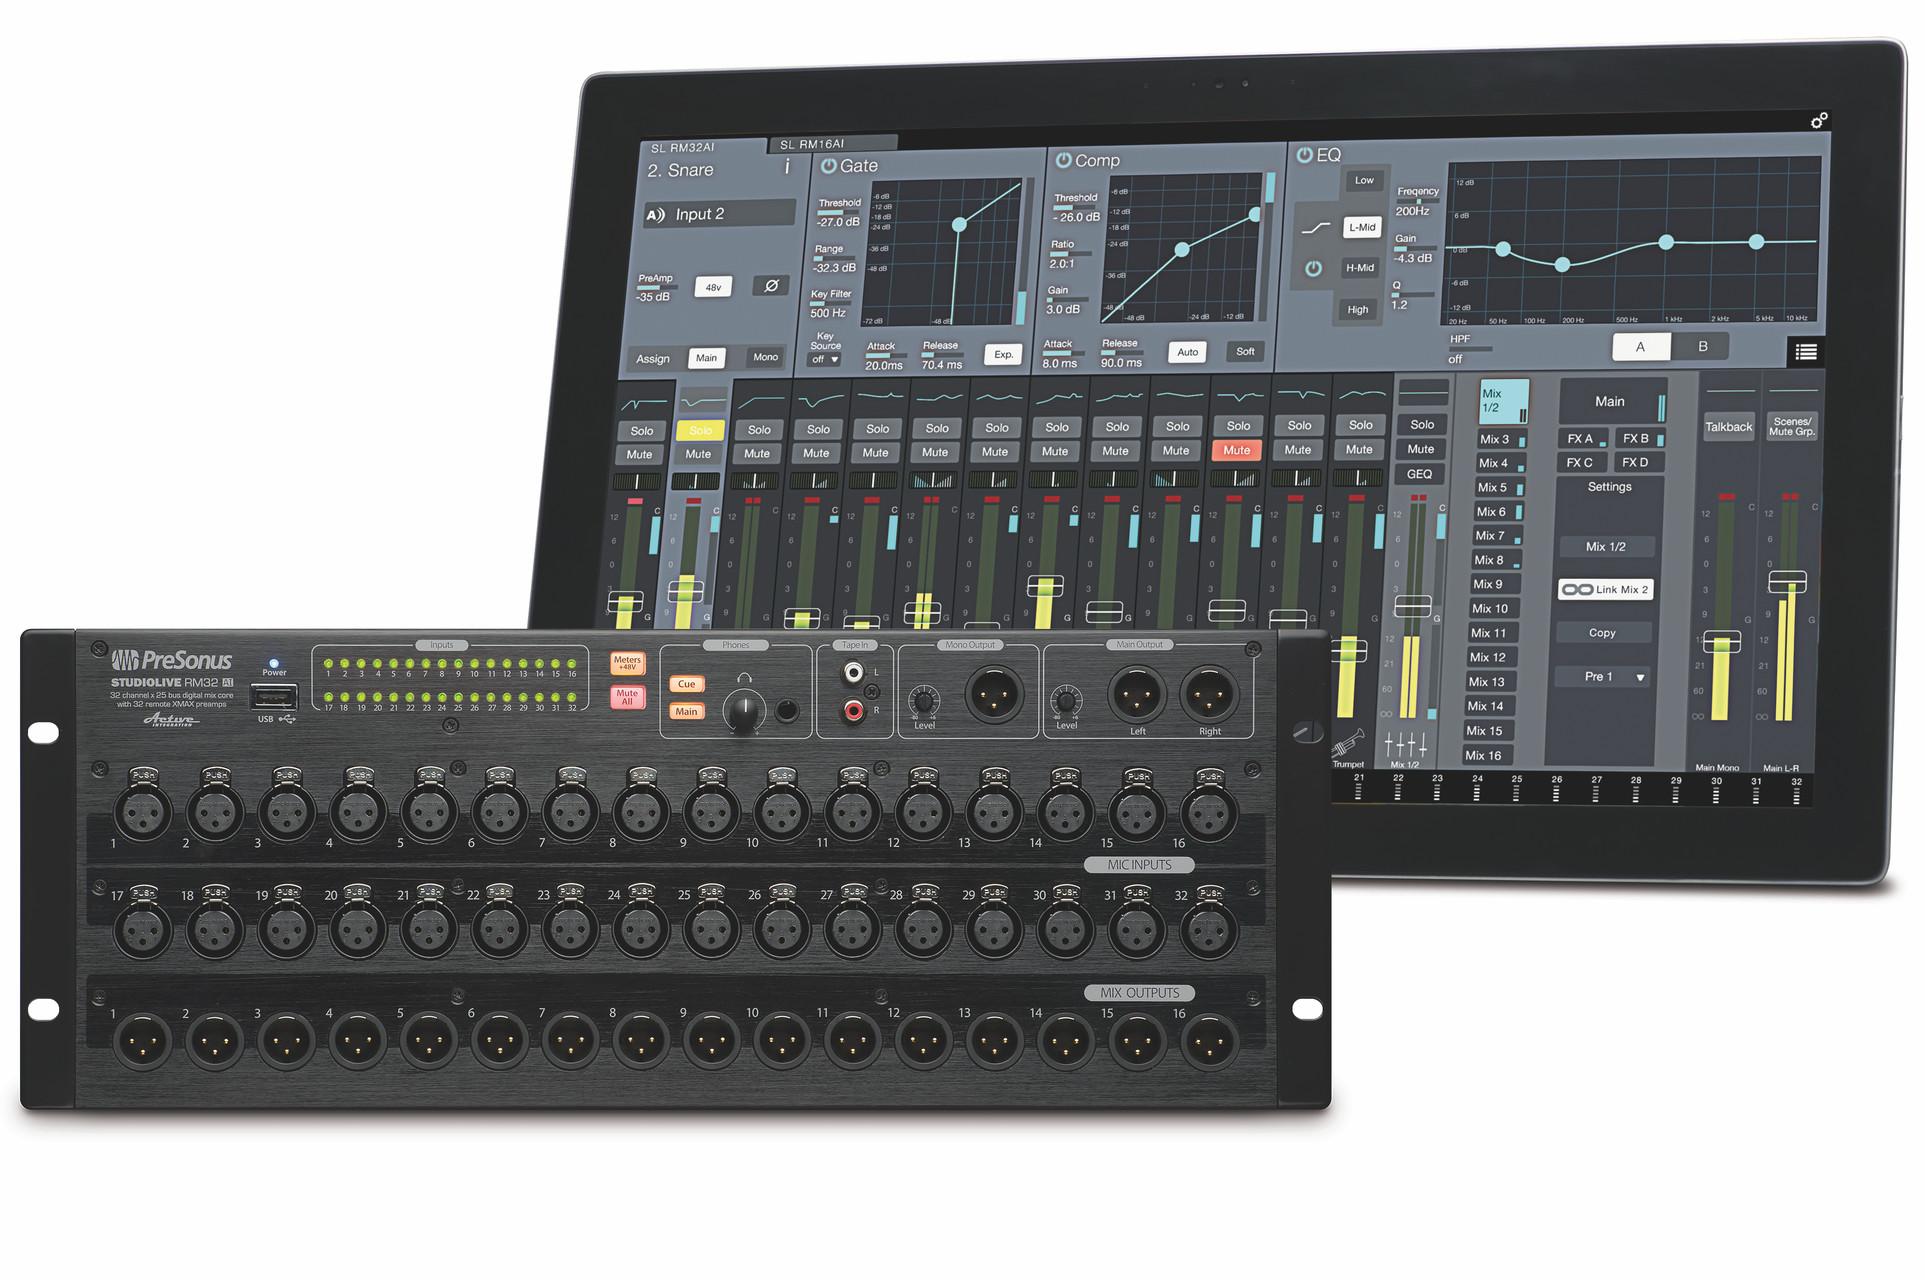 Presonus Launches Studiolive Rm Series Digital Mixers